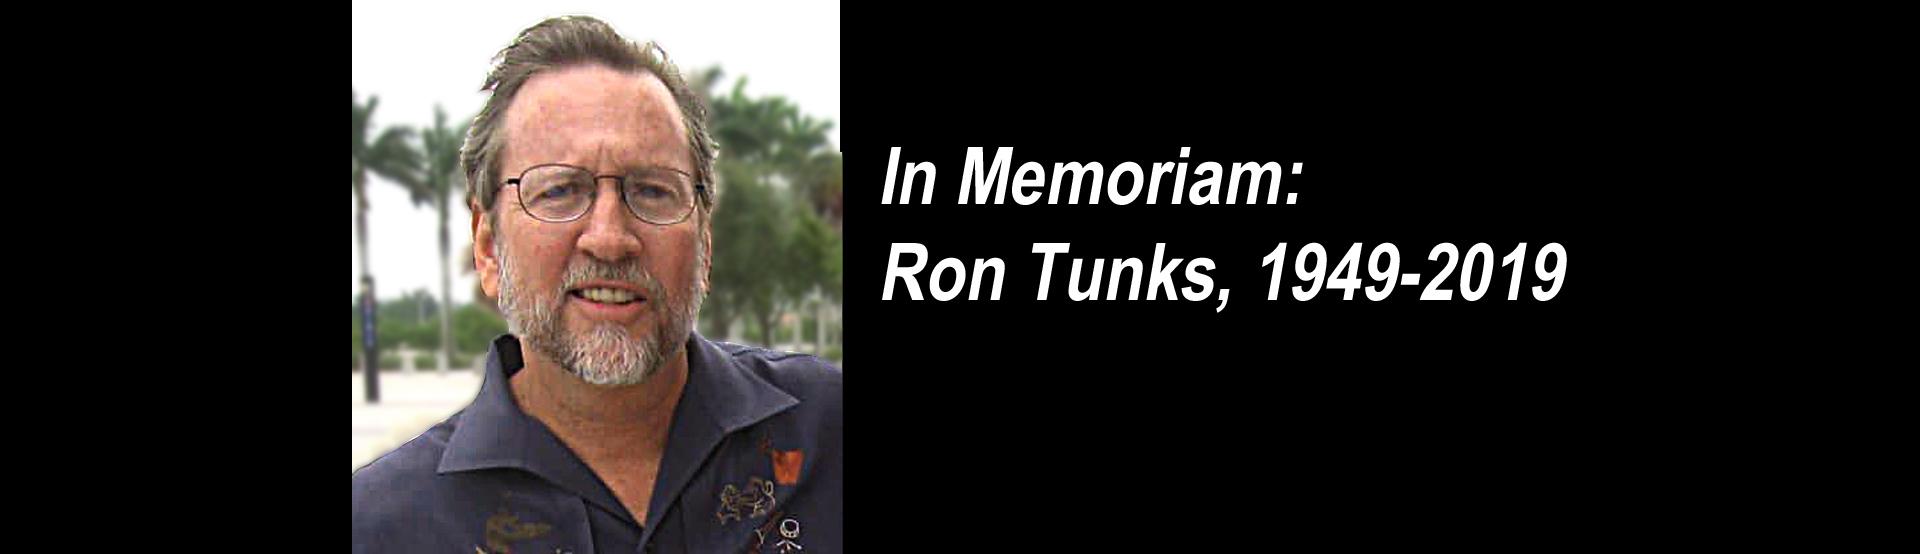 In Memoriam: Ron Tunks (1949 – 2019)